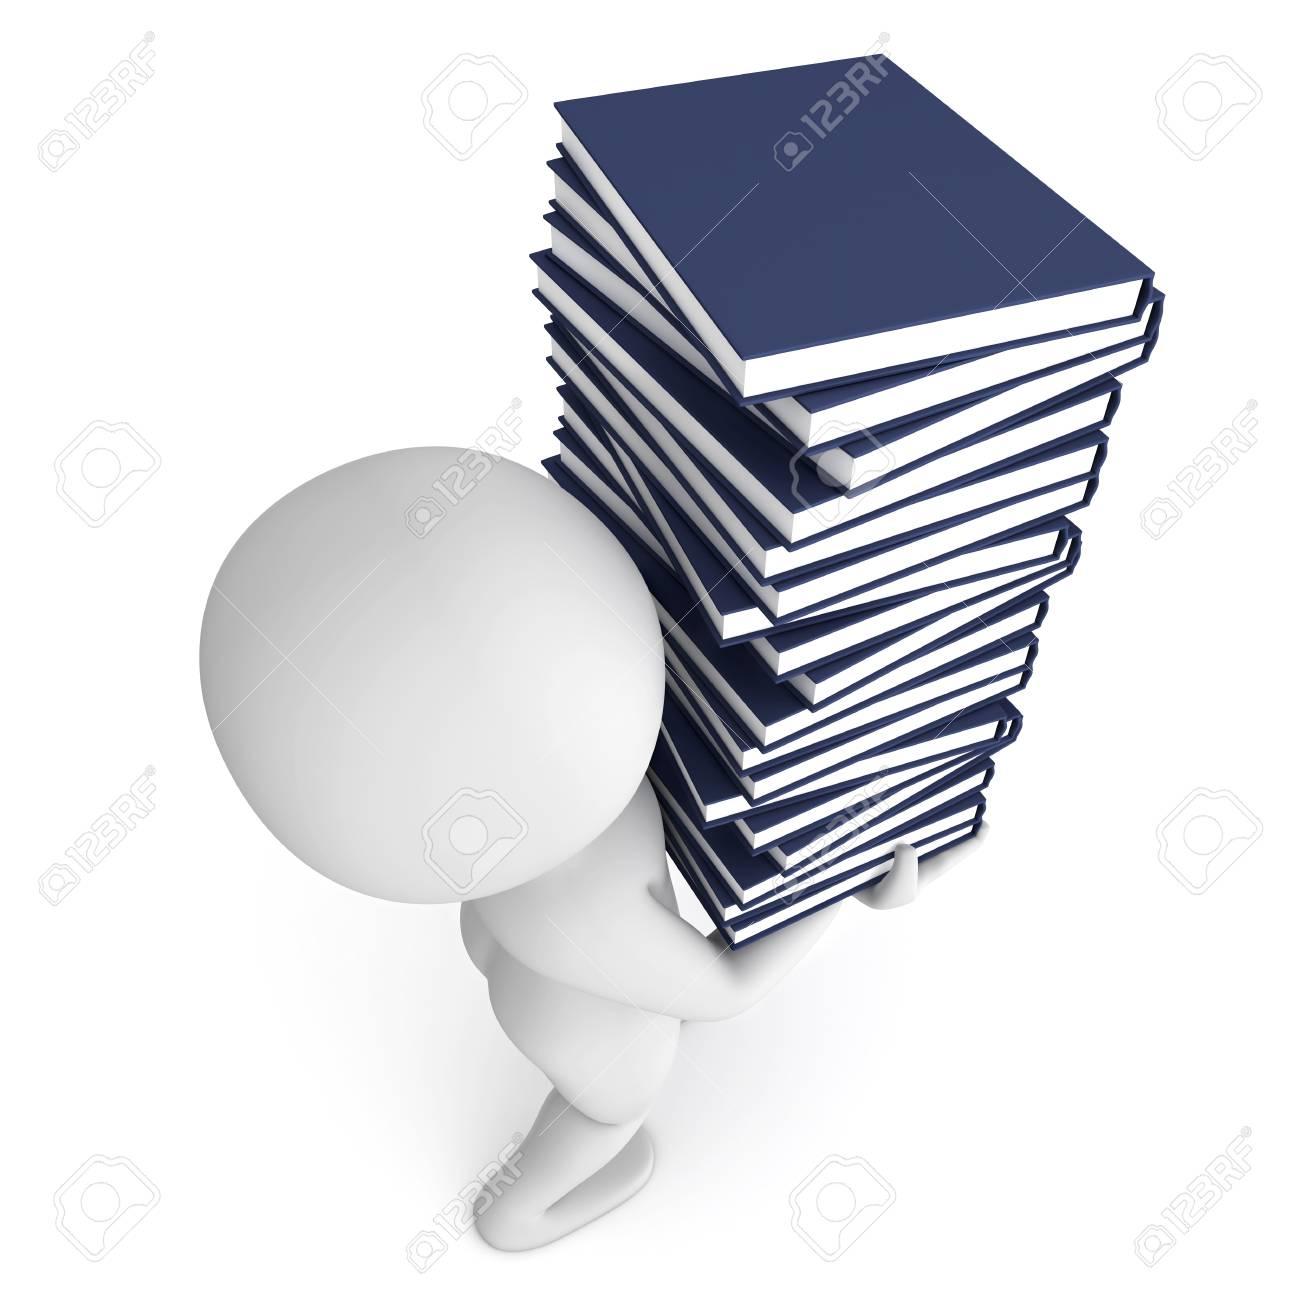 pile of books Stock Photo - 13564169